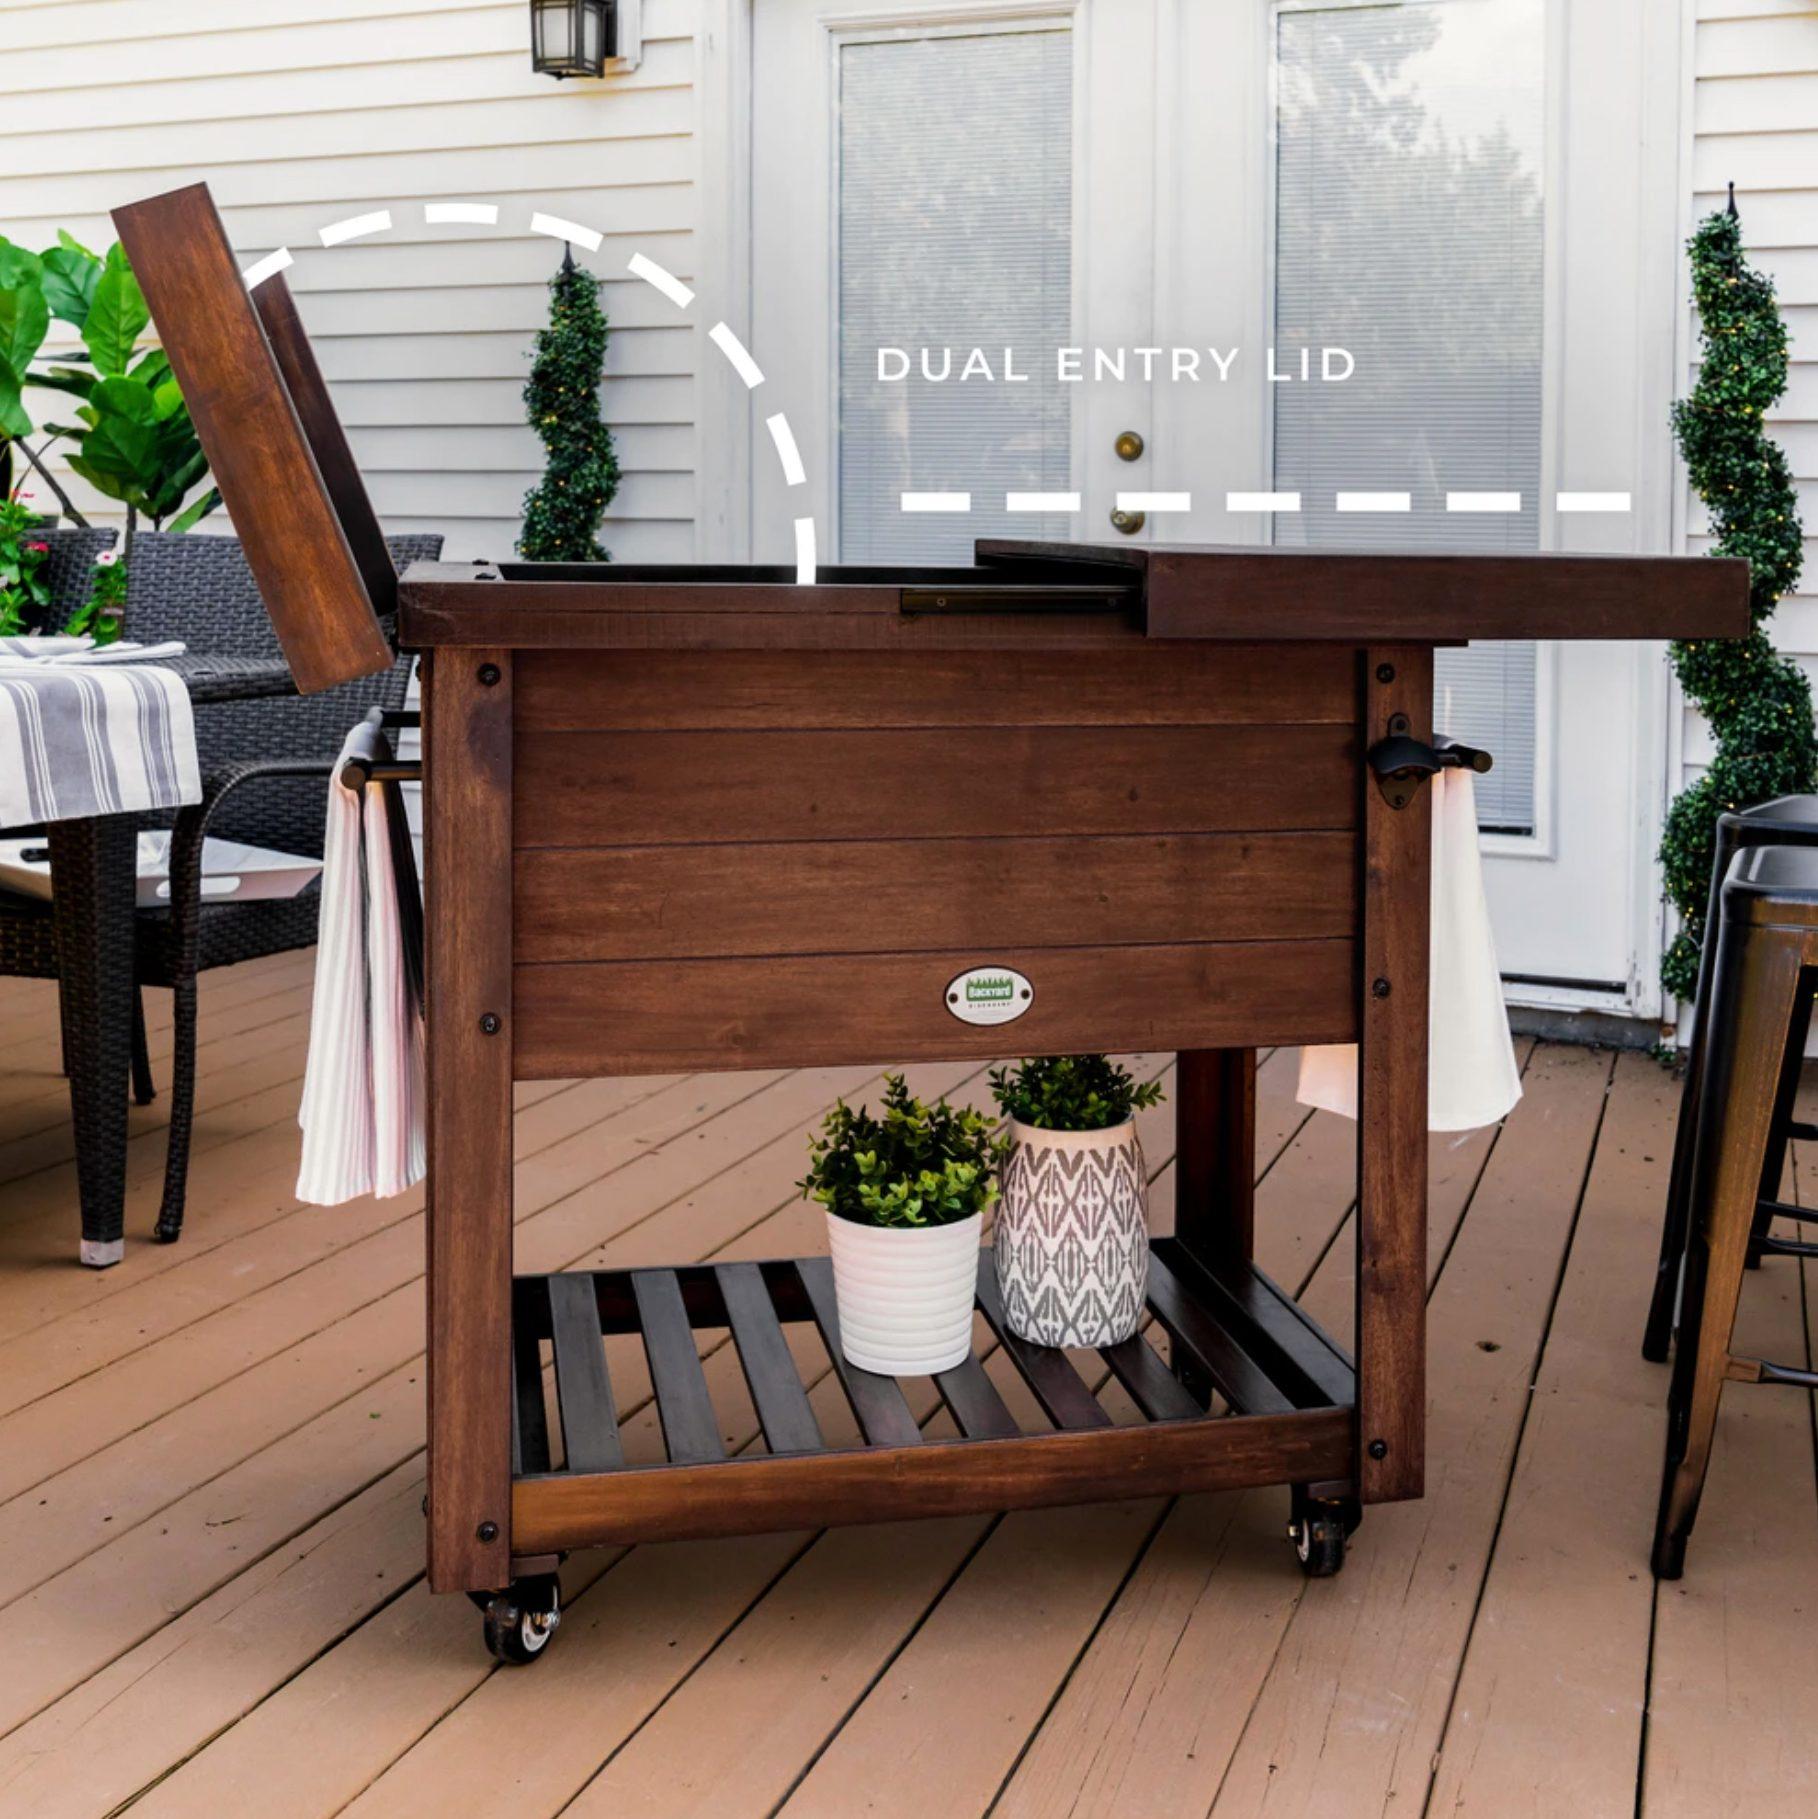 The 100 Quart Outdoor Cooler